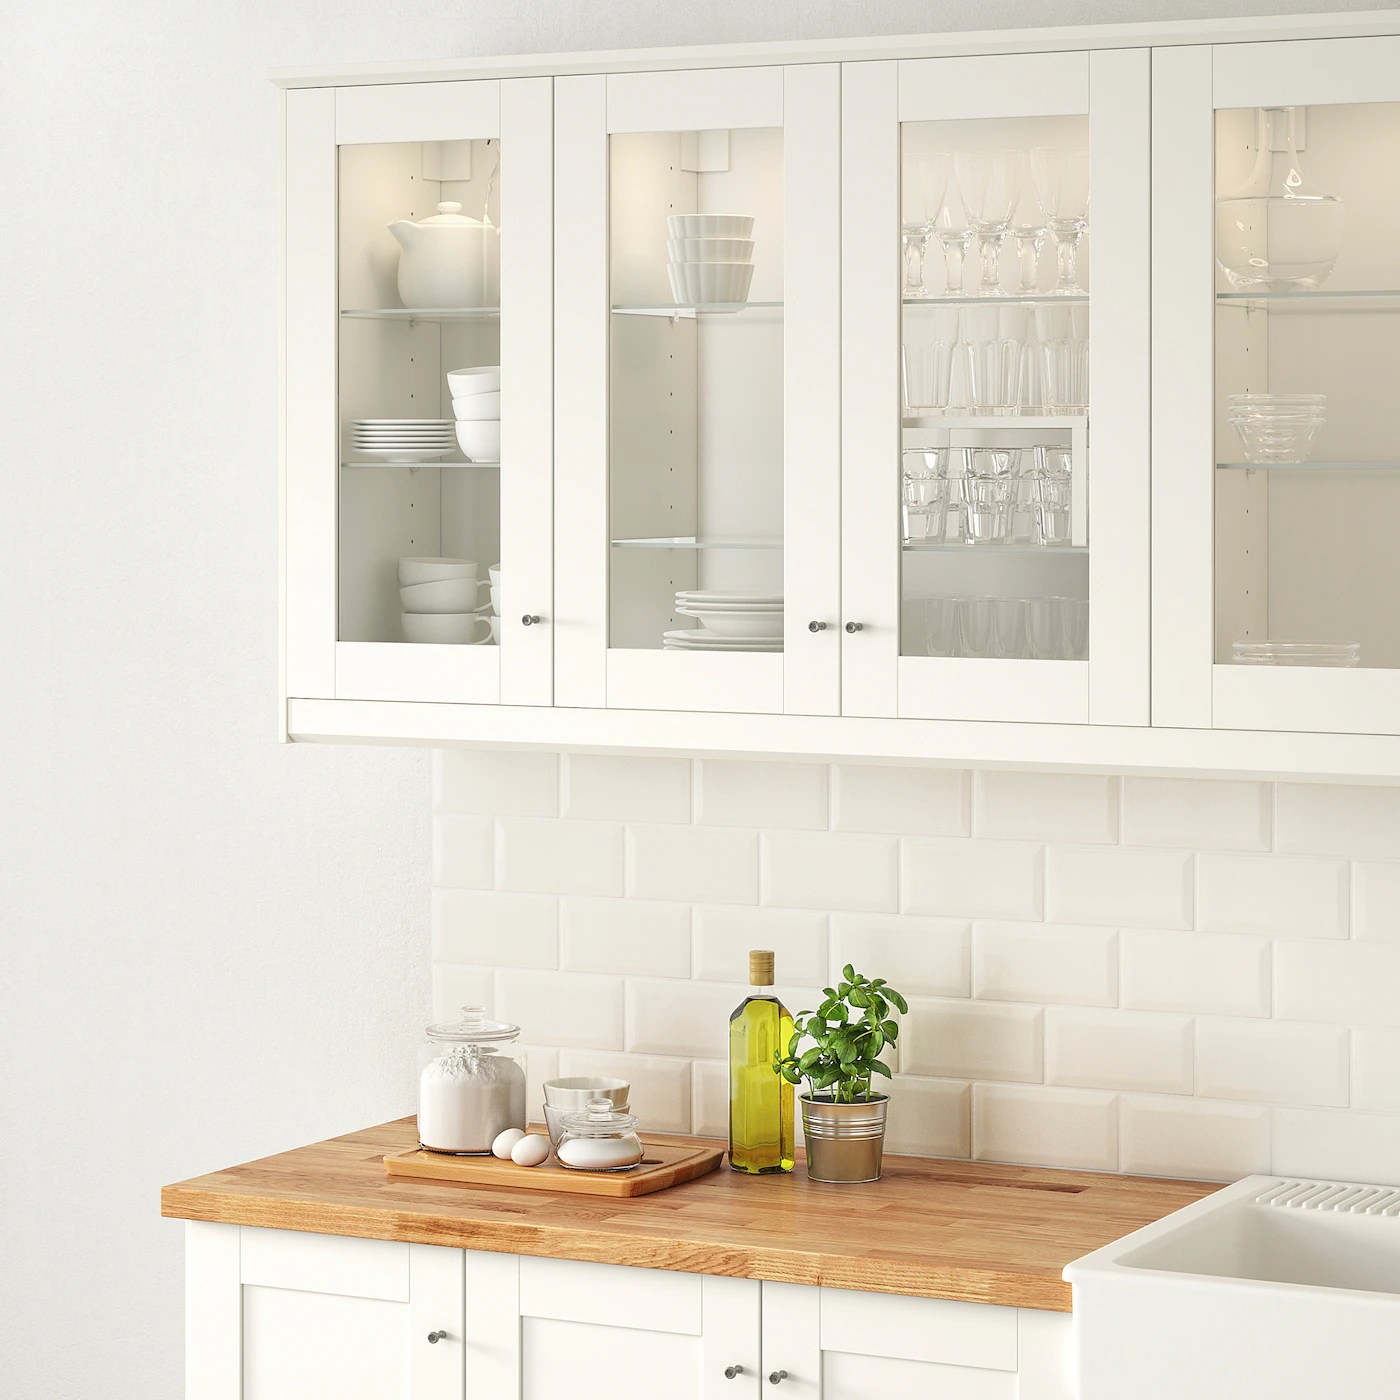 Savedal Glass Door White 30x100 Cm Ikea